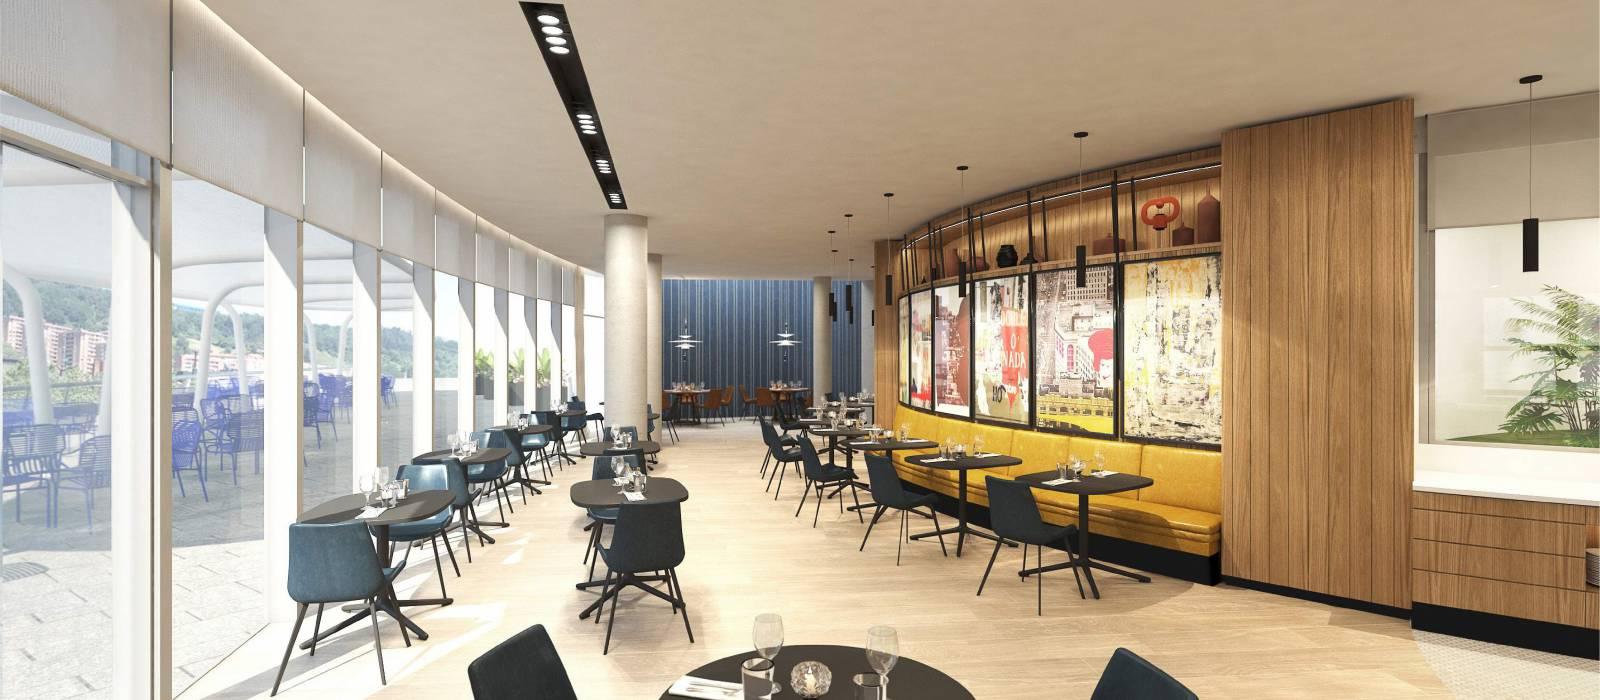 Vincci Bilbao - Restaurante